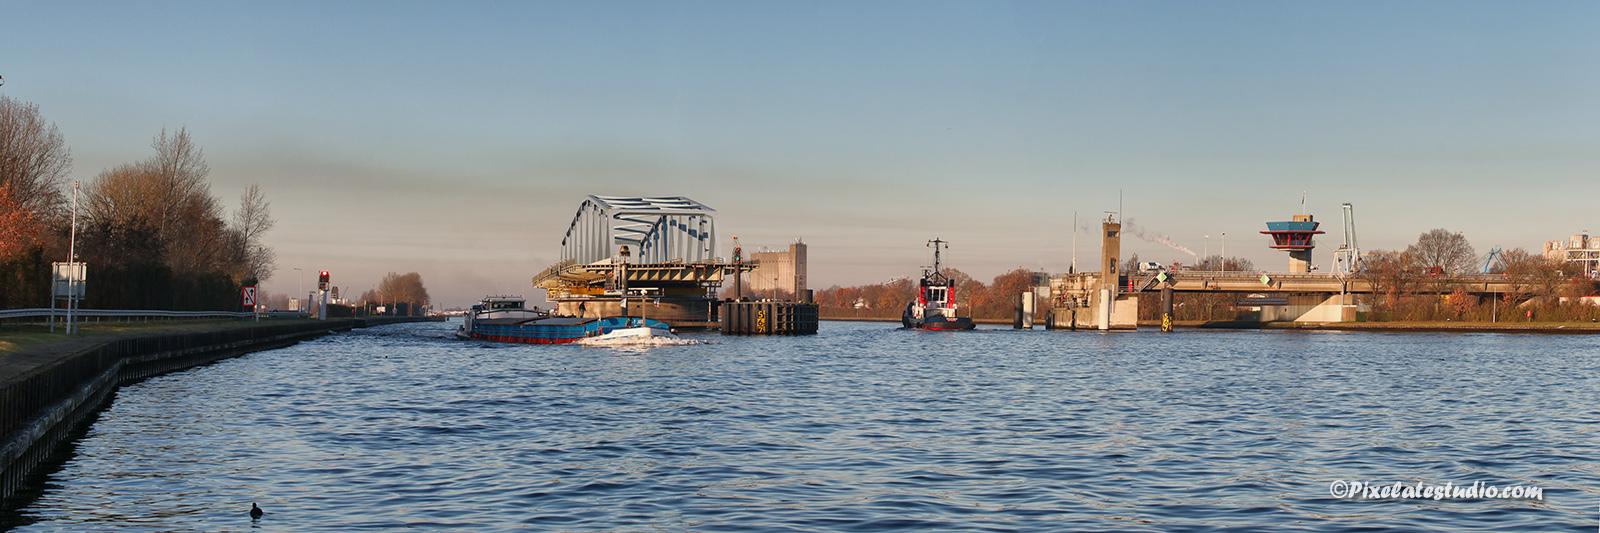 Panorama foto van de brug van sluiskil, mooie foto